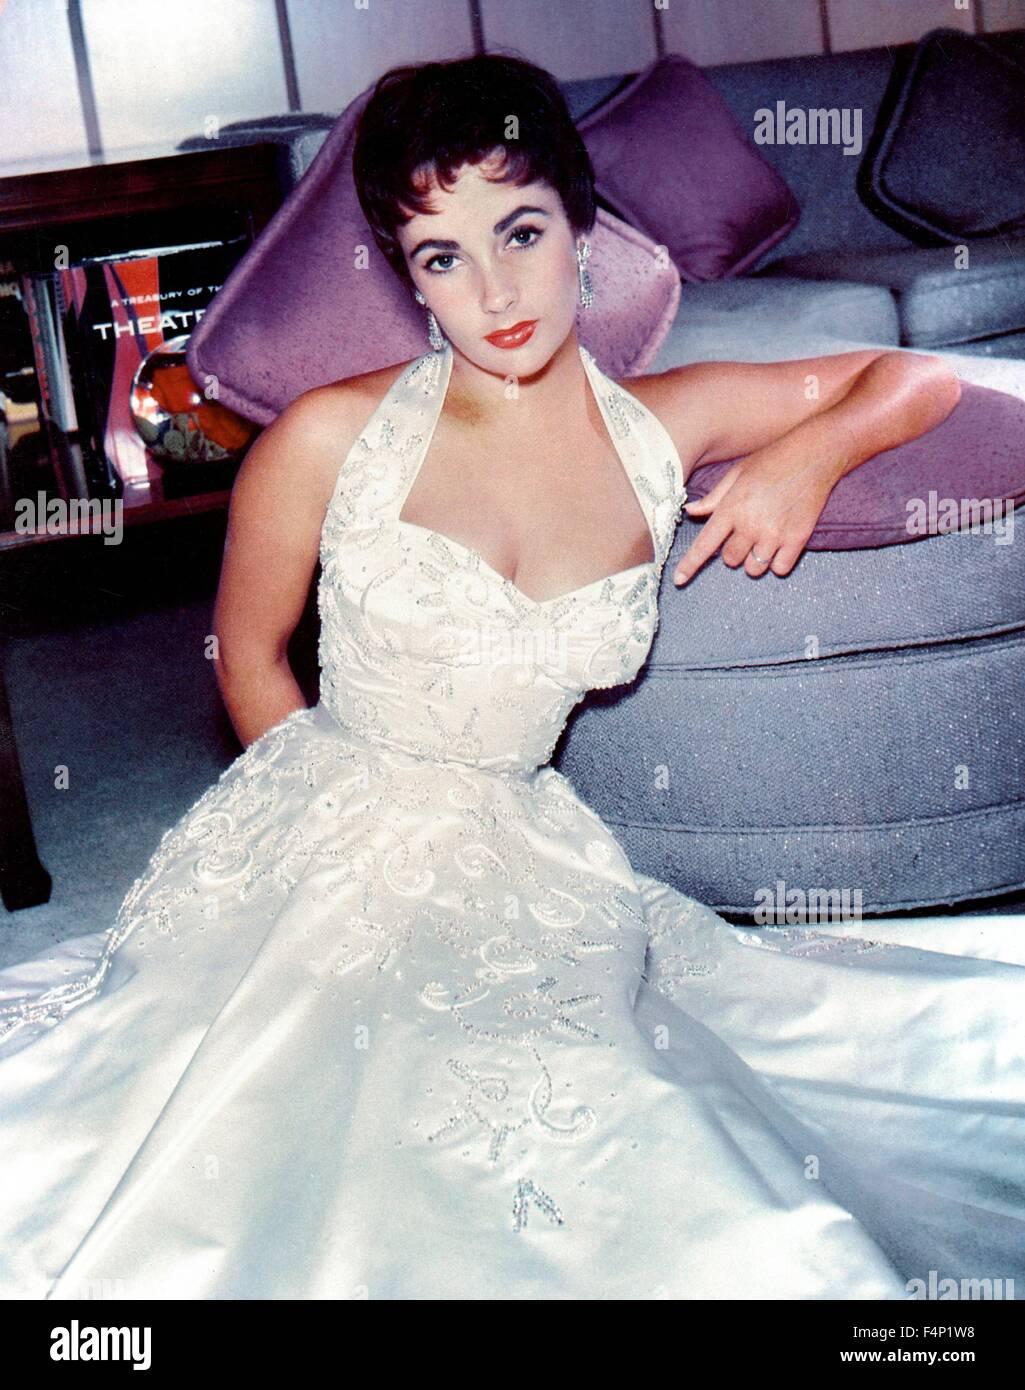 Elizabeth Taylor in 1970 - Stock Image